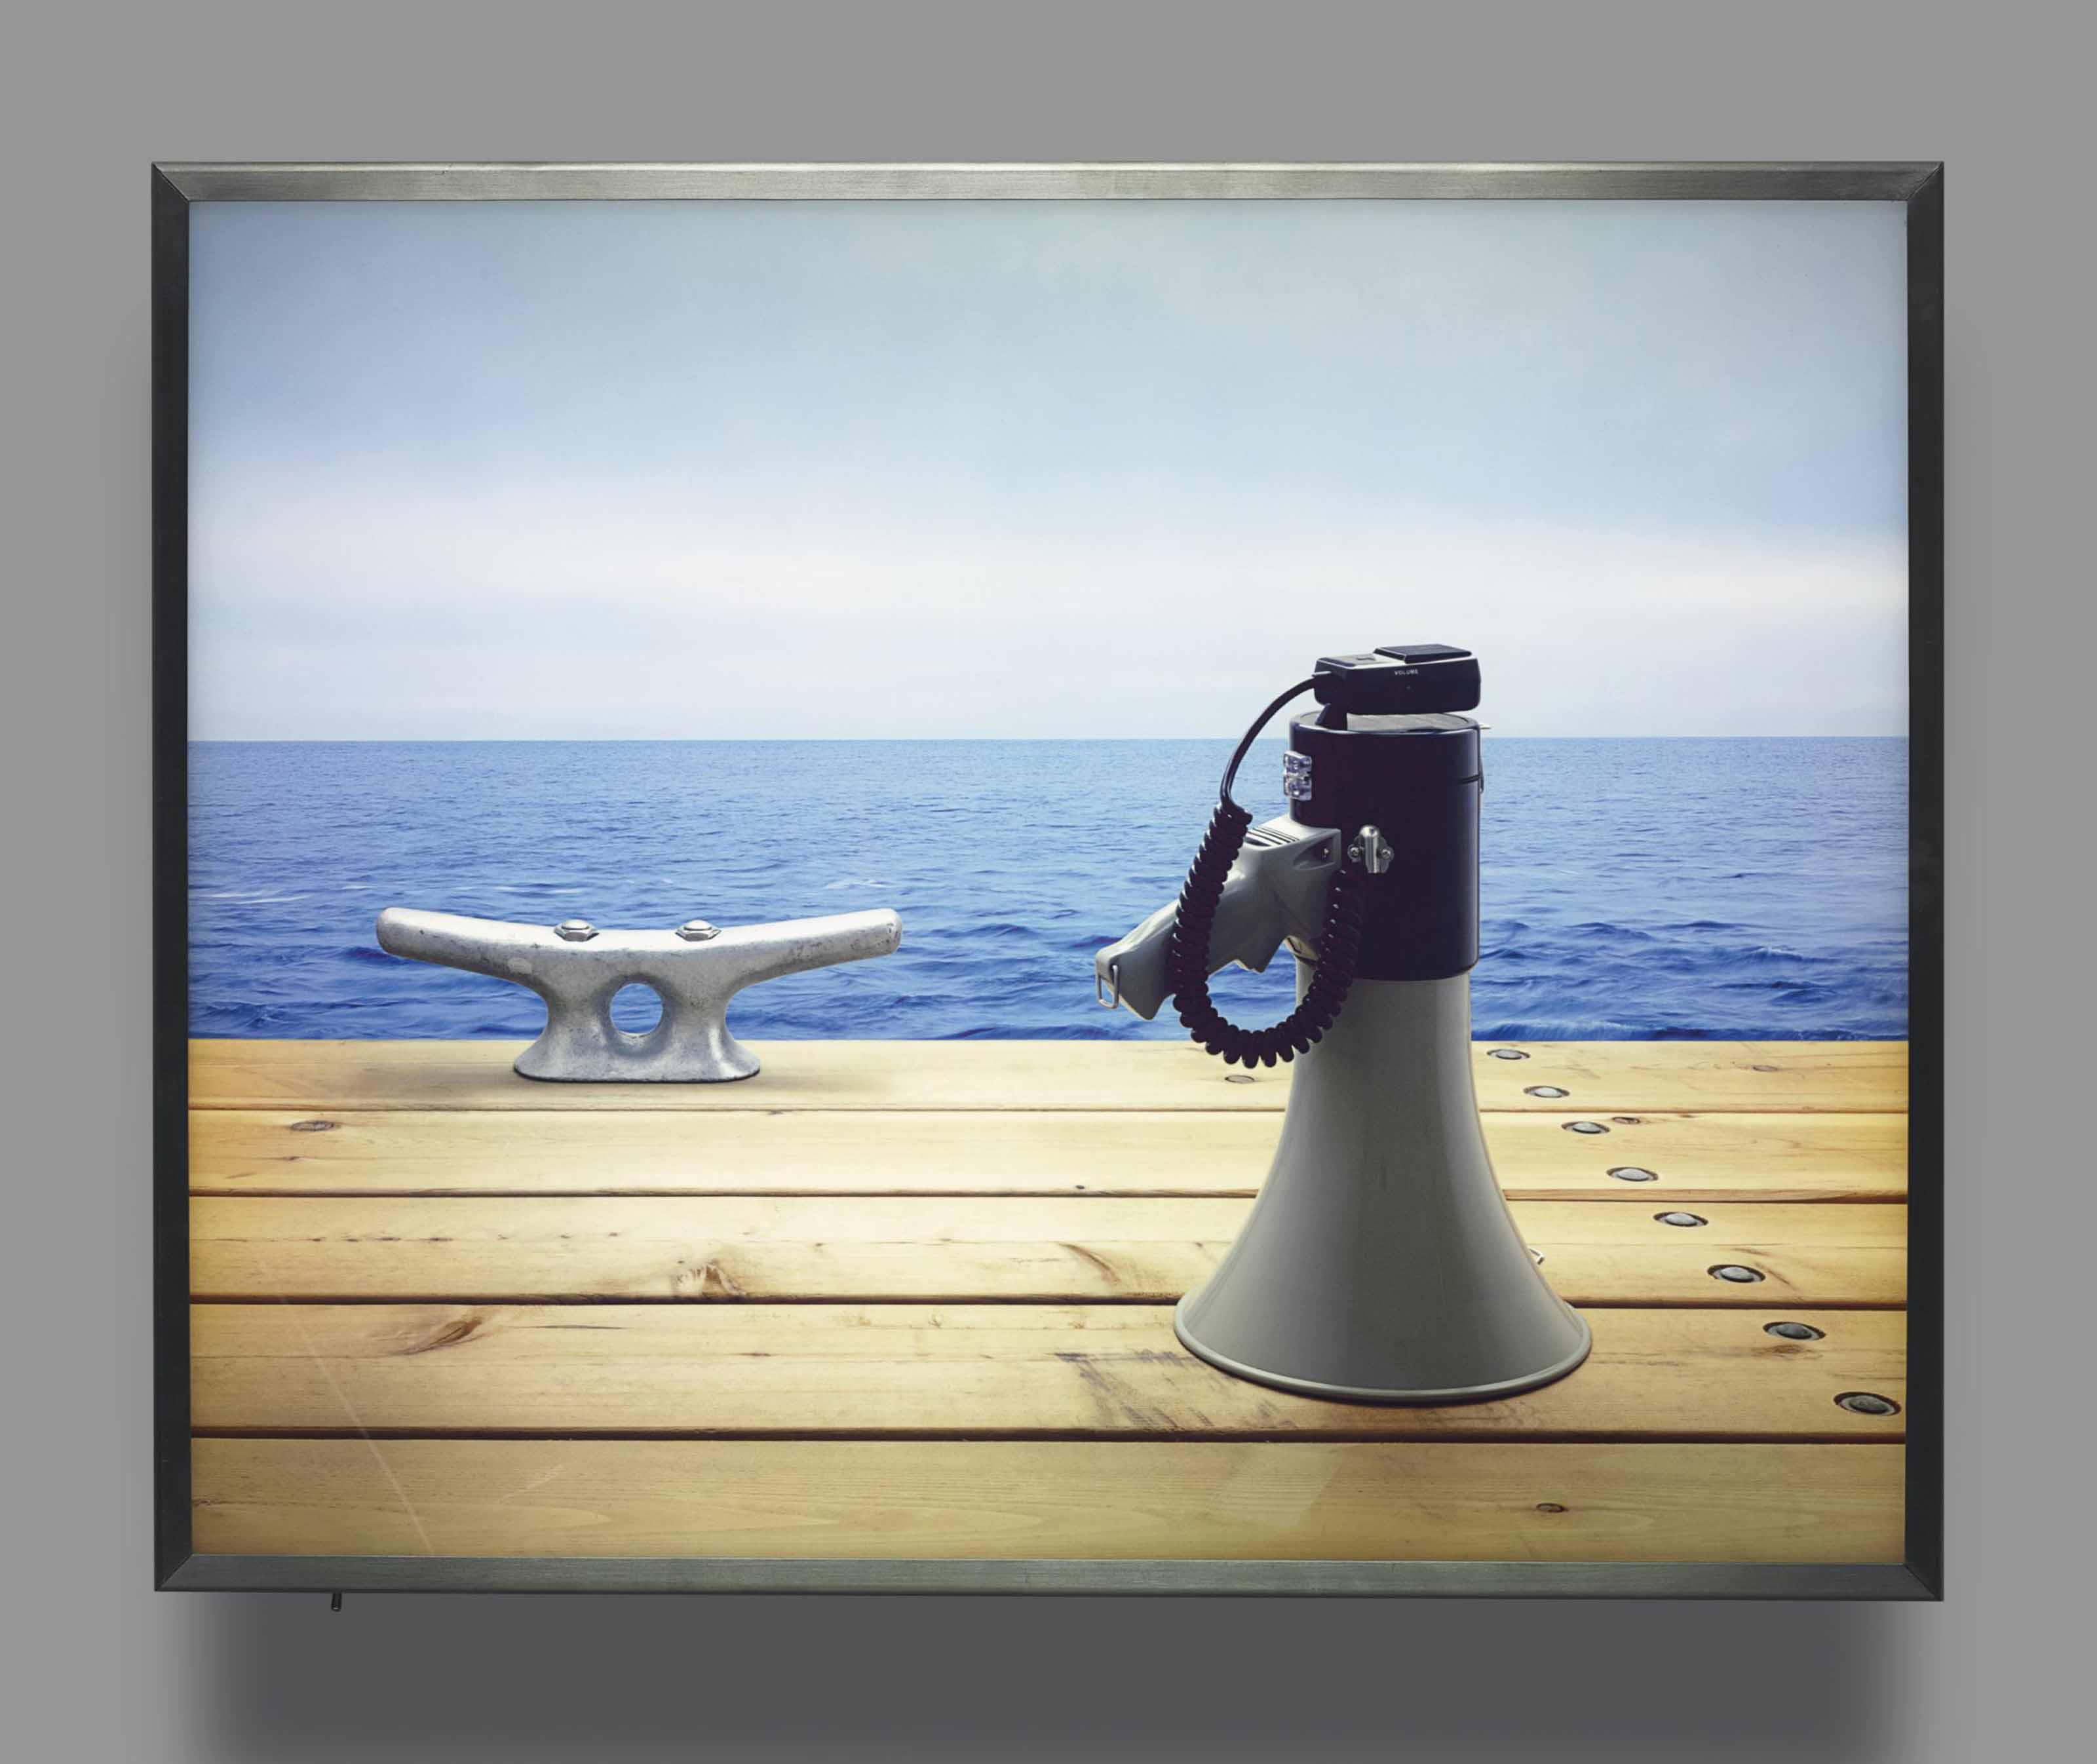 Nautical Scene with Loudhailer